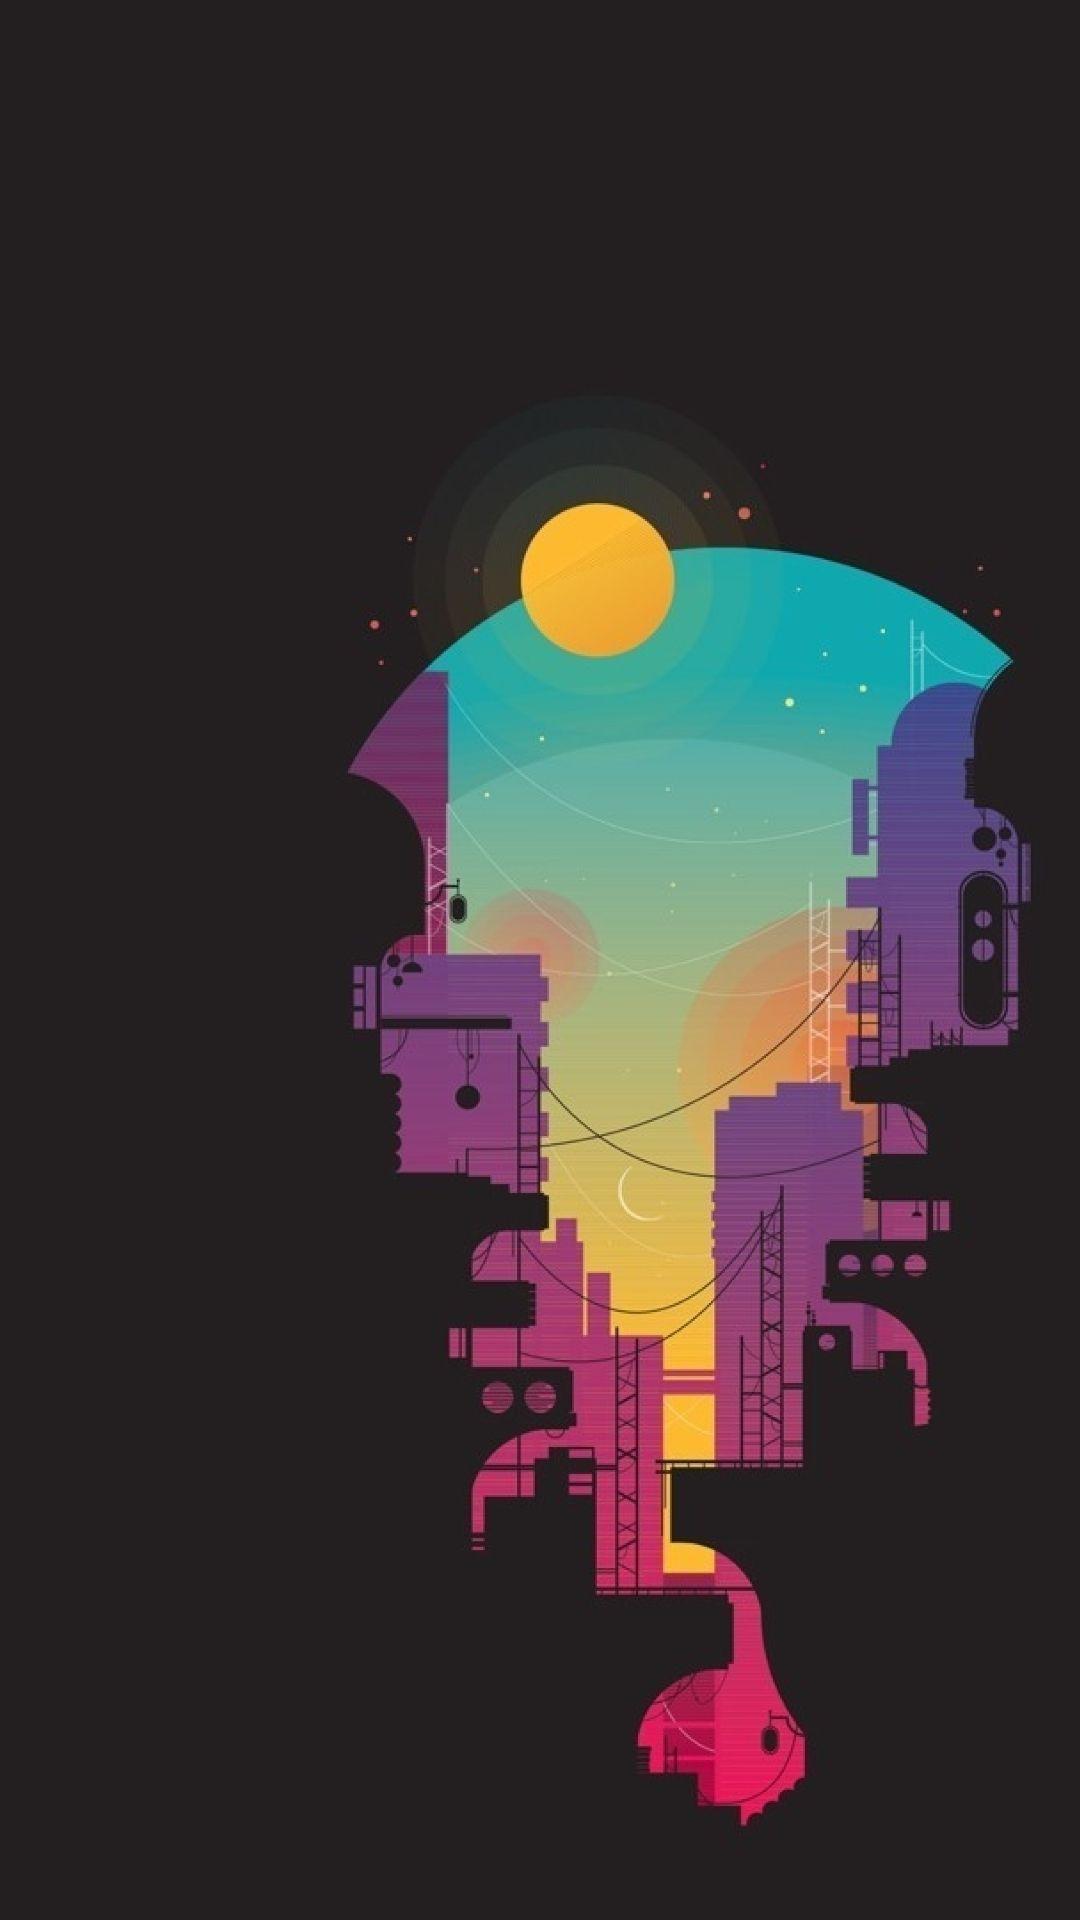 Minimalistic Cyberpunk Wallpapers - Wallpaper Cave